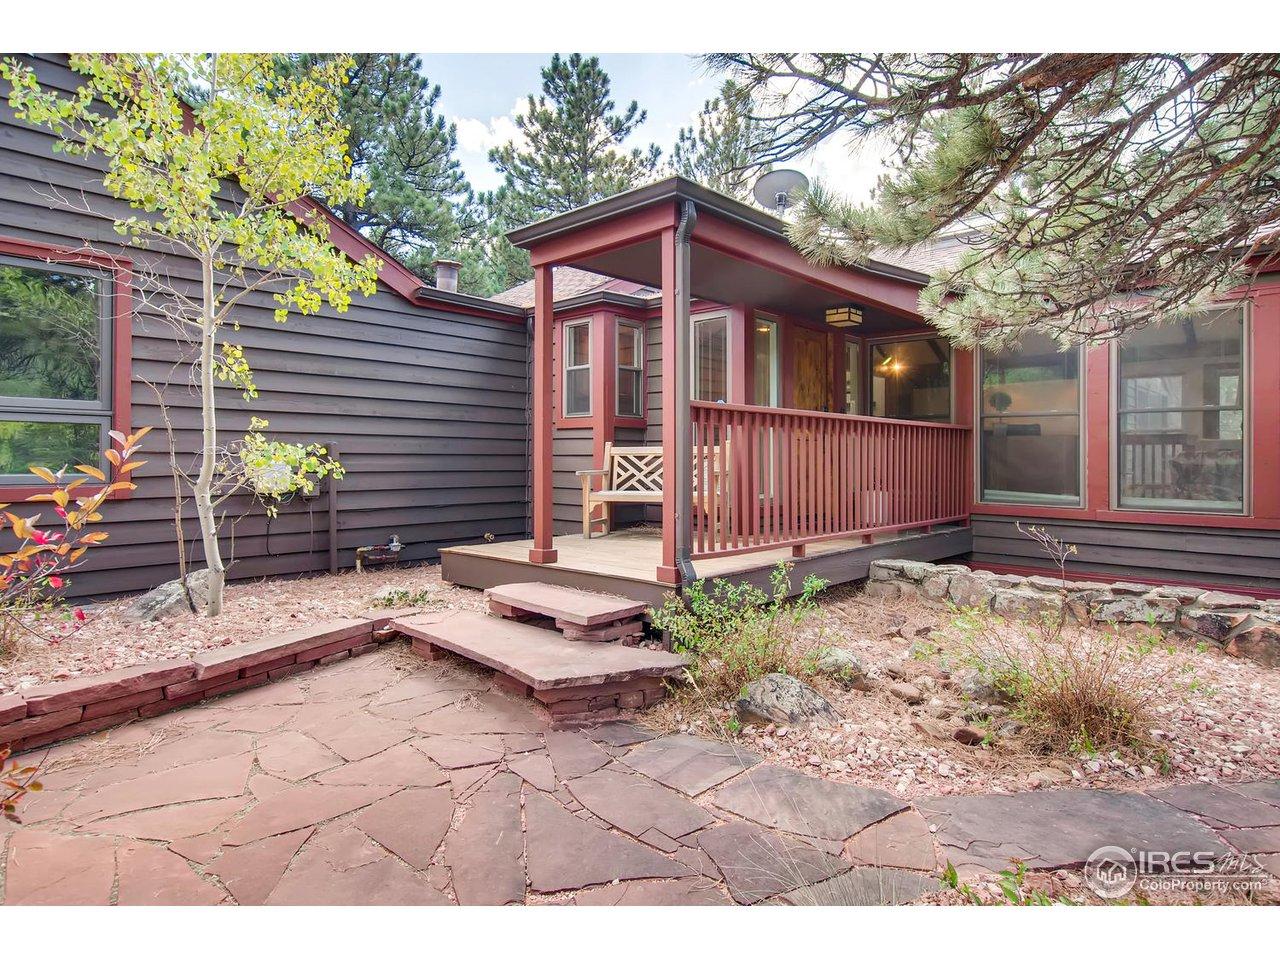 2708 S Lakeridge Trl, Boulder CO 80302